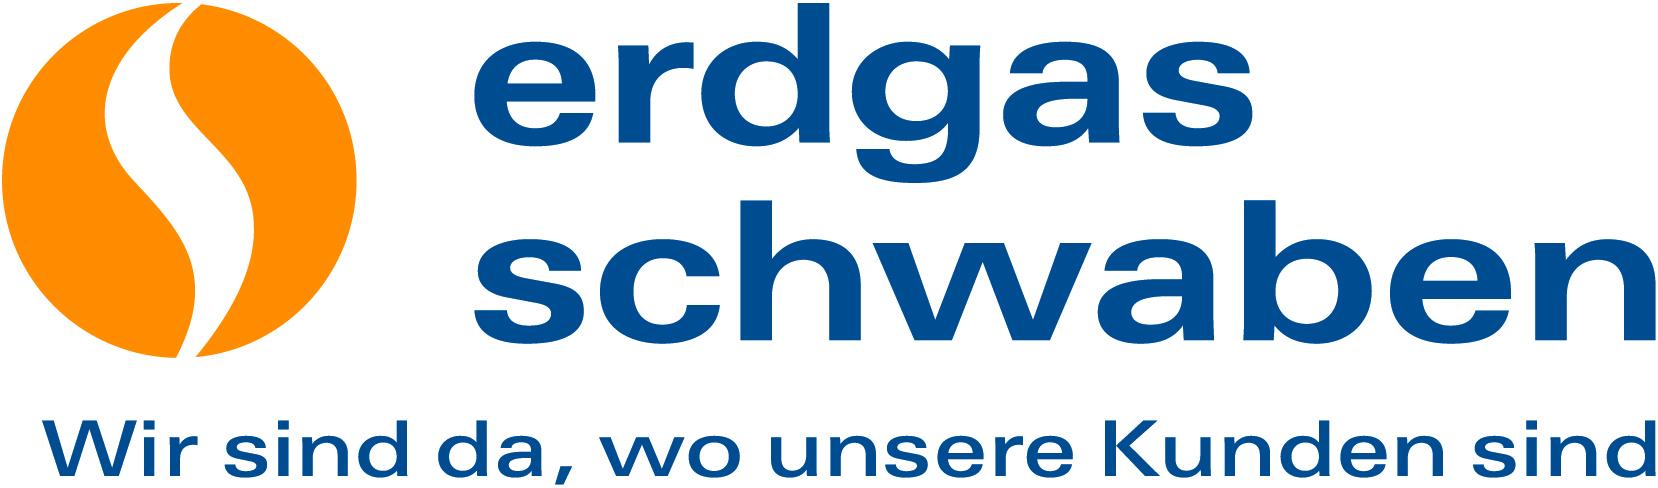 Erdgas Schwaben_Logo_4c